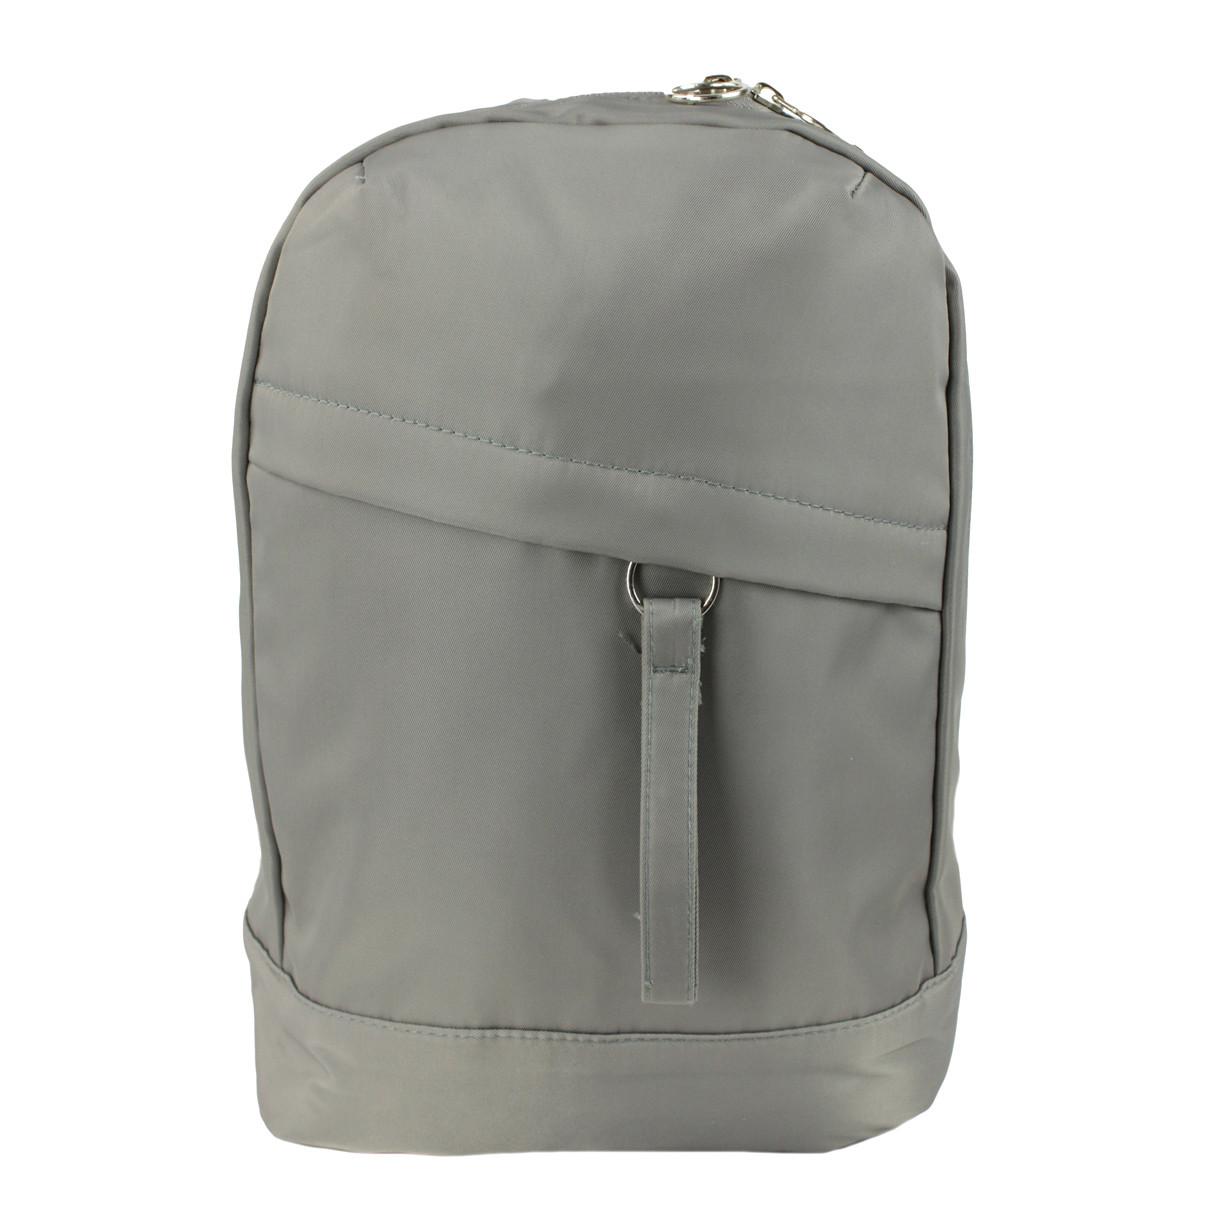 Рюкзак школьный тканевый Slo серый